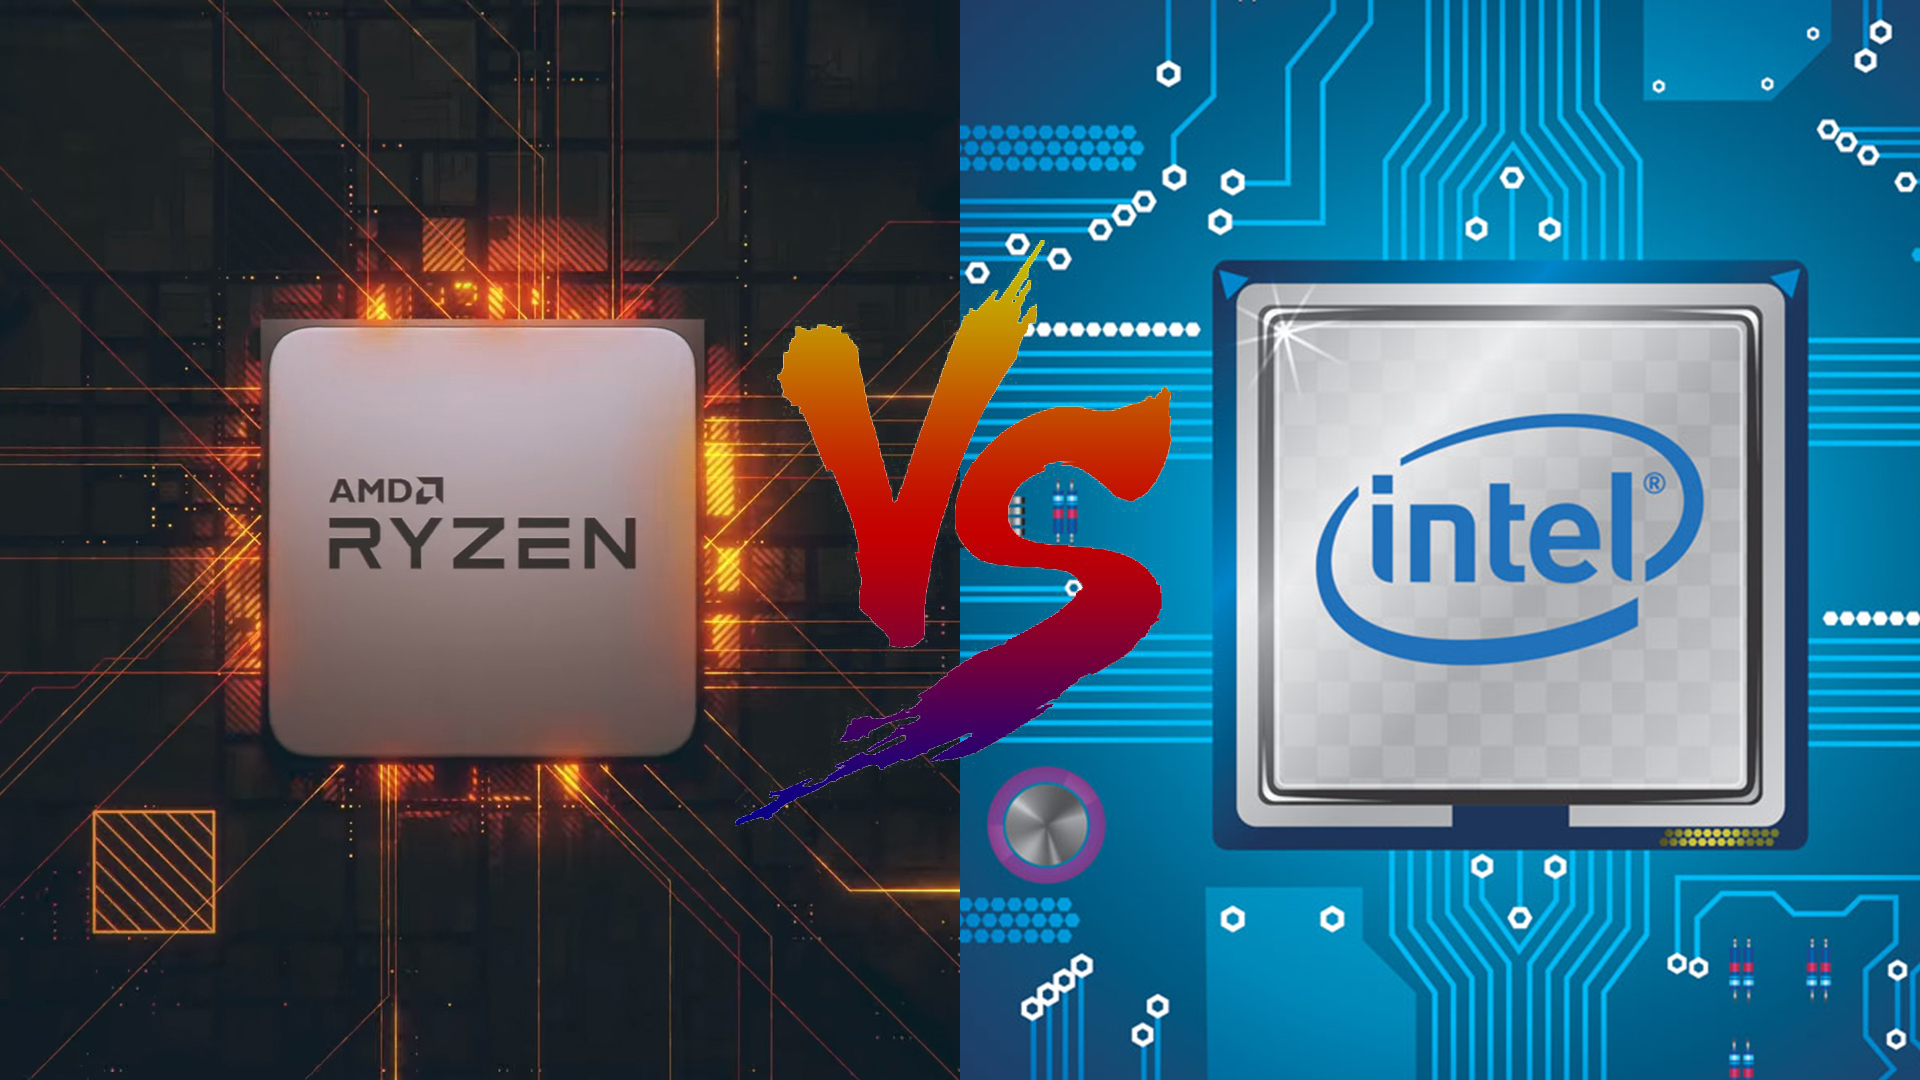 Amd Ryzen 5 4500u Vs Intel Core I5 10210u Ryzen 5 Demolishes Core I5 With 27 More Cpu And 133 More Gpu Power